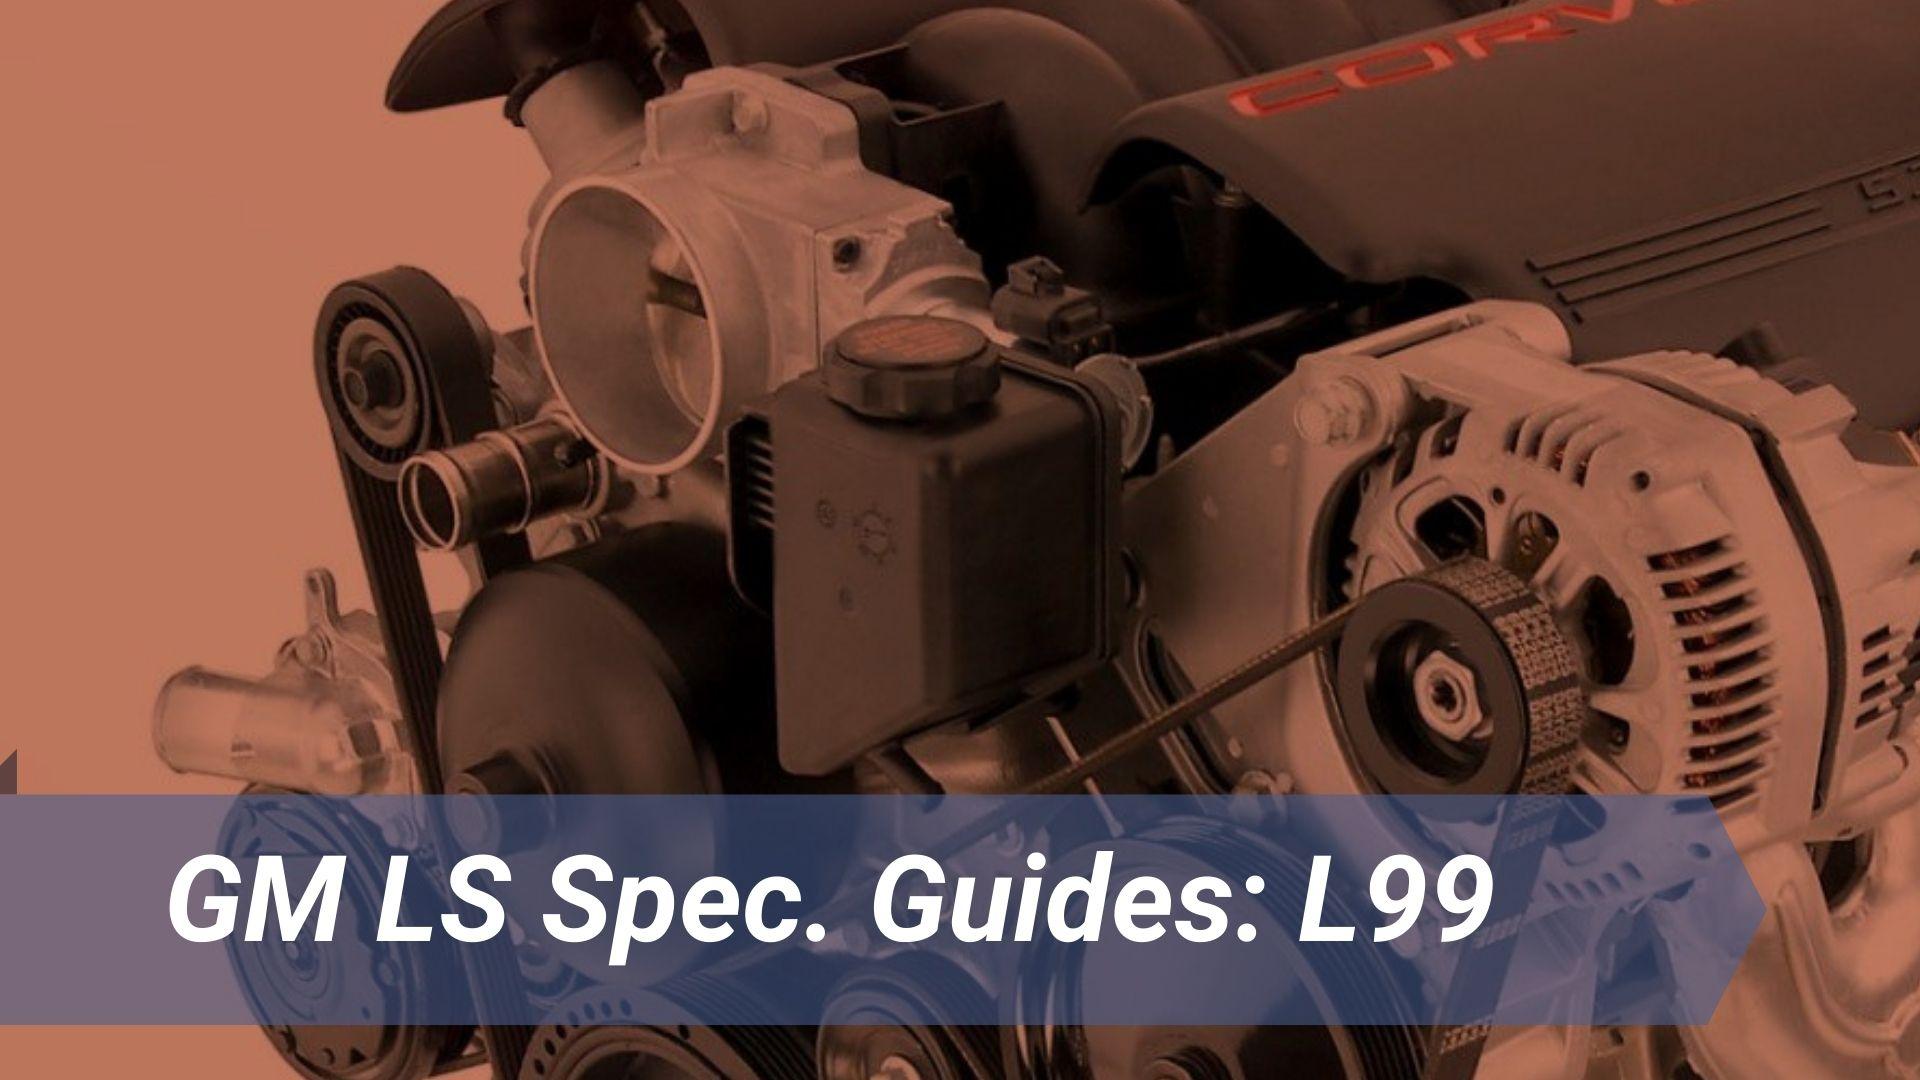 L99 6.2L Engine Specs: Performance, Bore & Stroke, Cylinder Heads, Cam Specs  & More | Chevrolet L99 Engine Diagram |  | OnAllCylinders